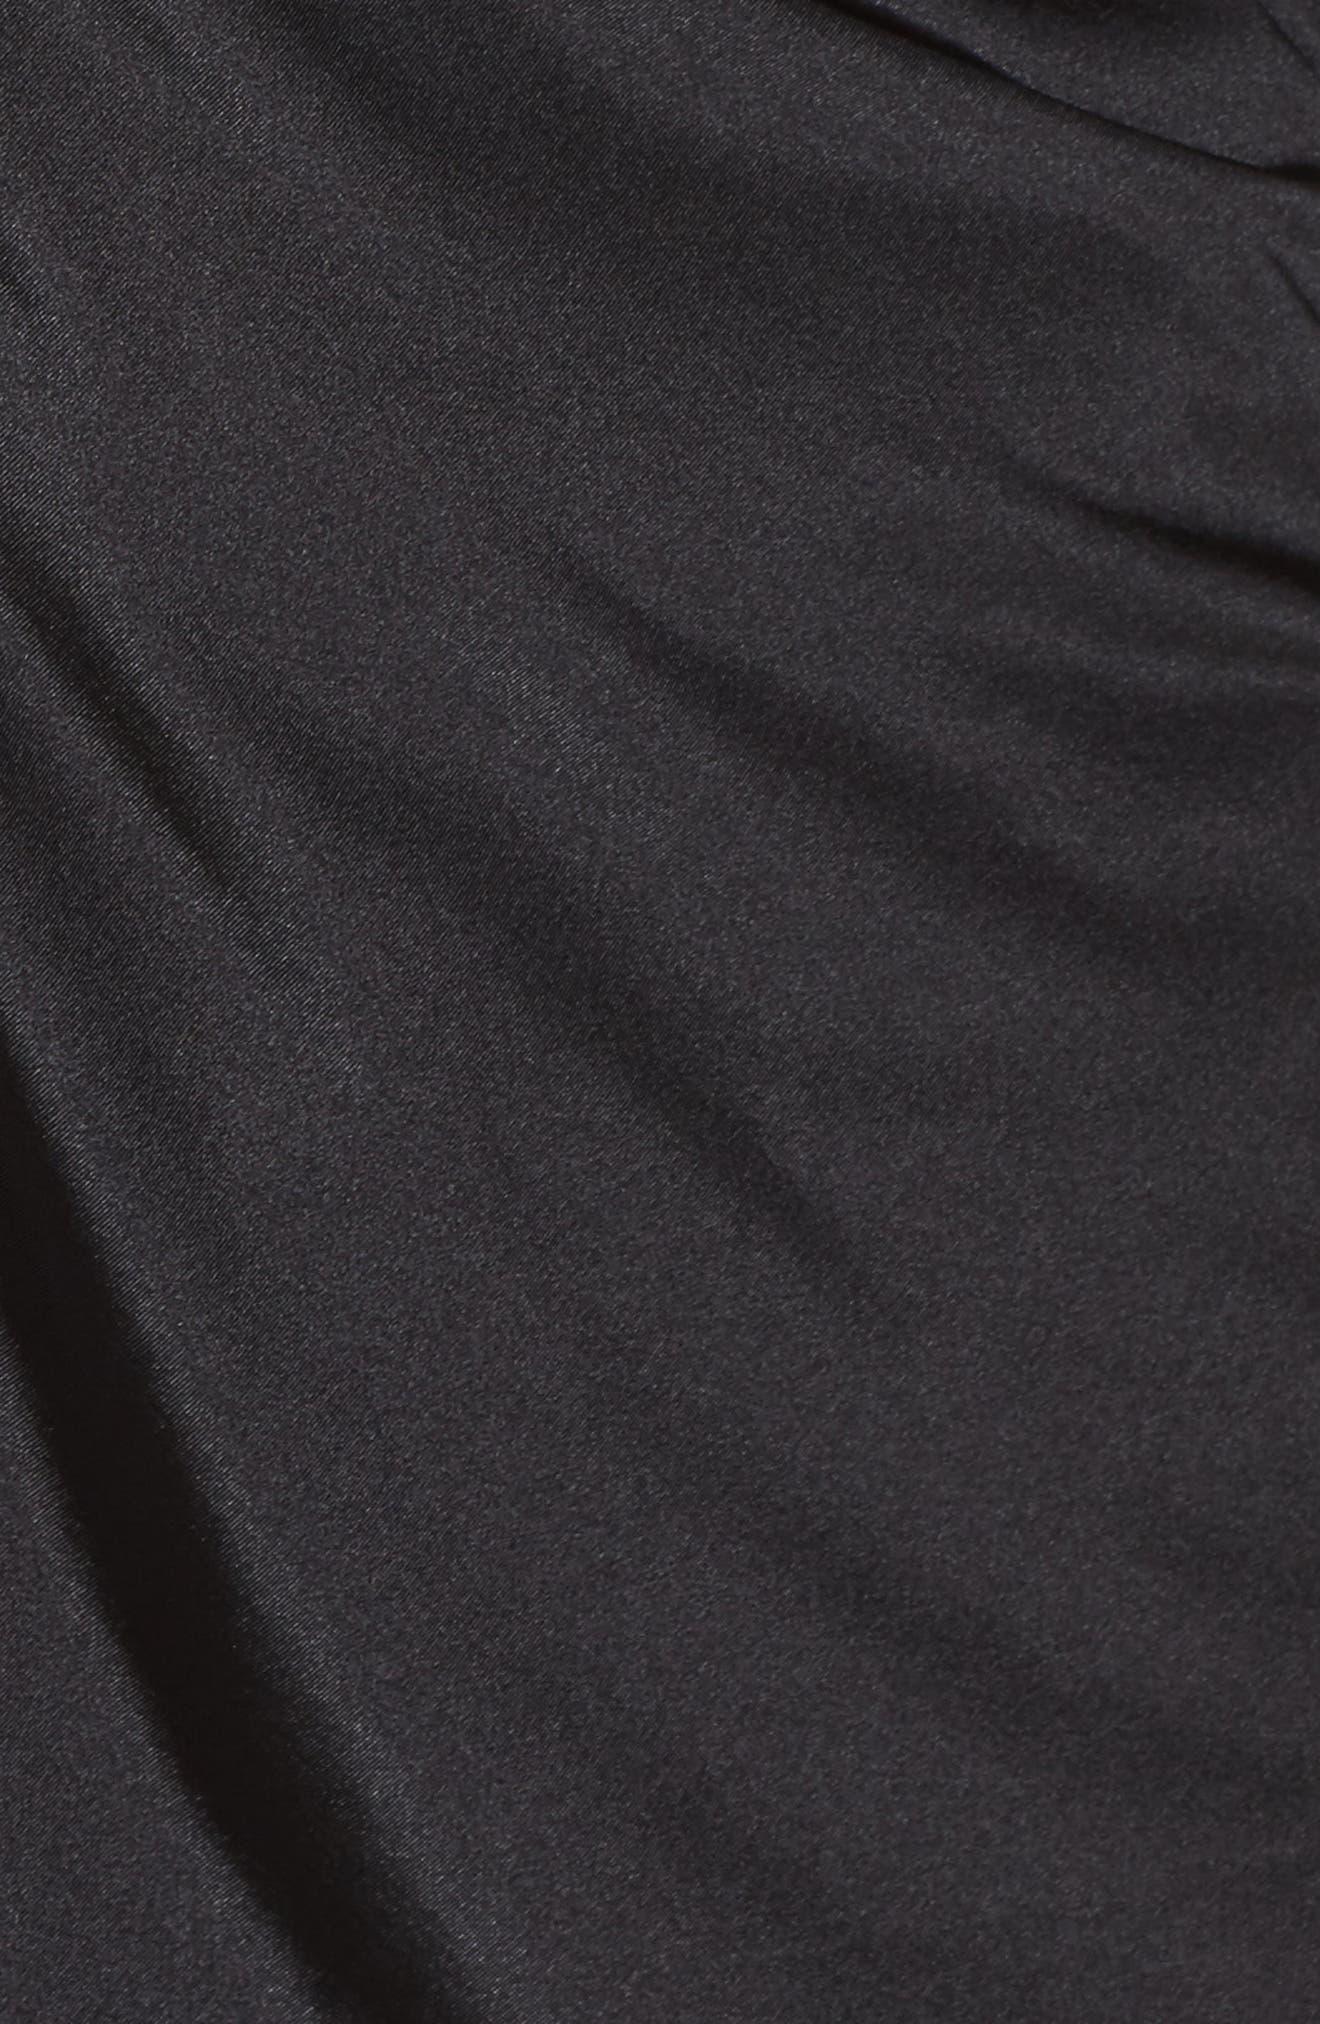 Drape Front Top,                             Alternate thumbnail 4, color,                             Black